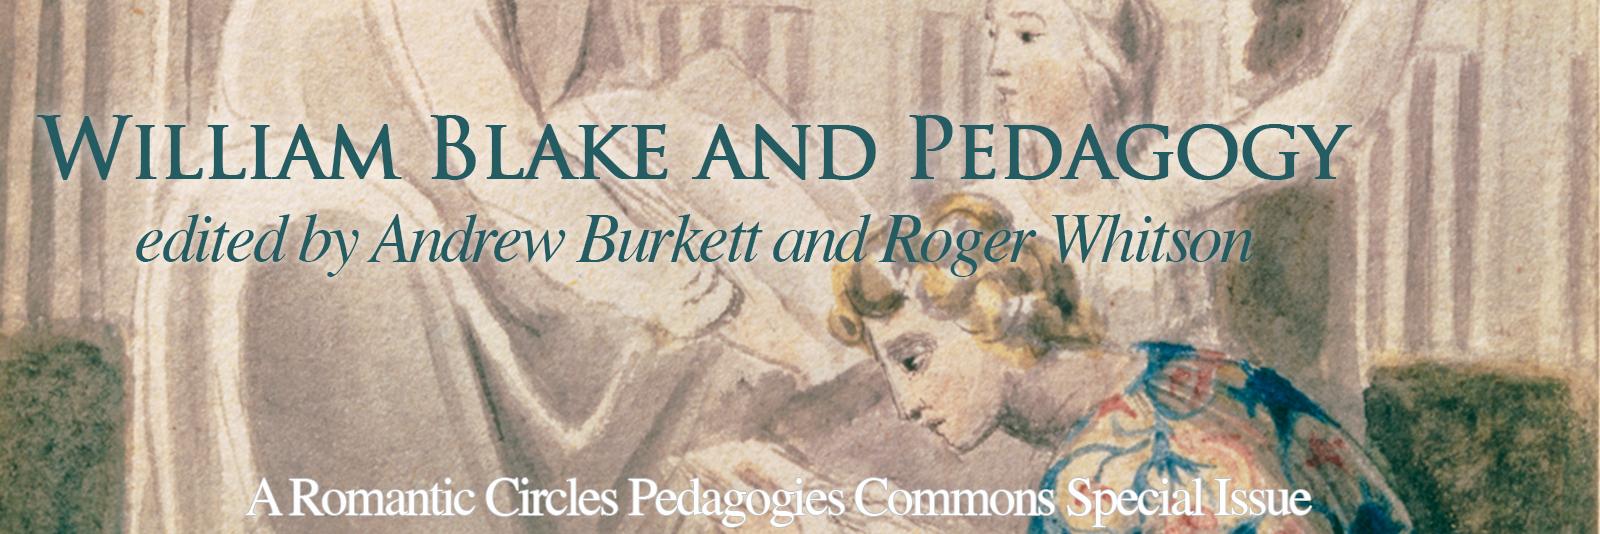 William Blake and Pedagogy